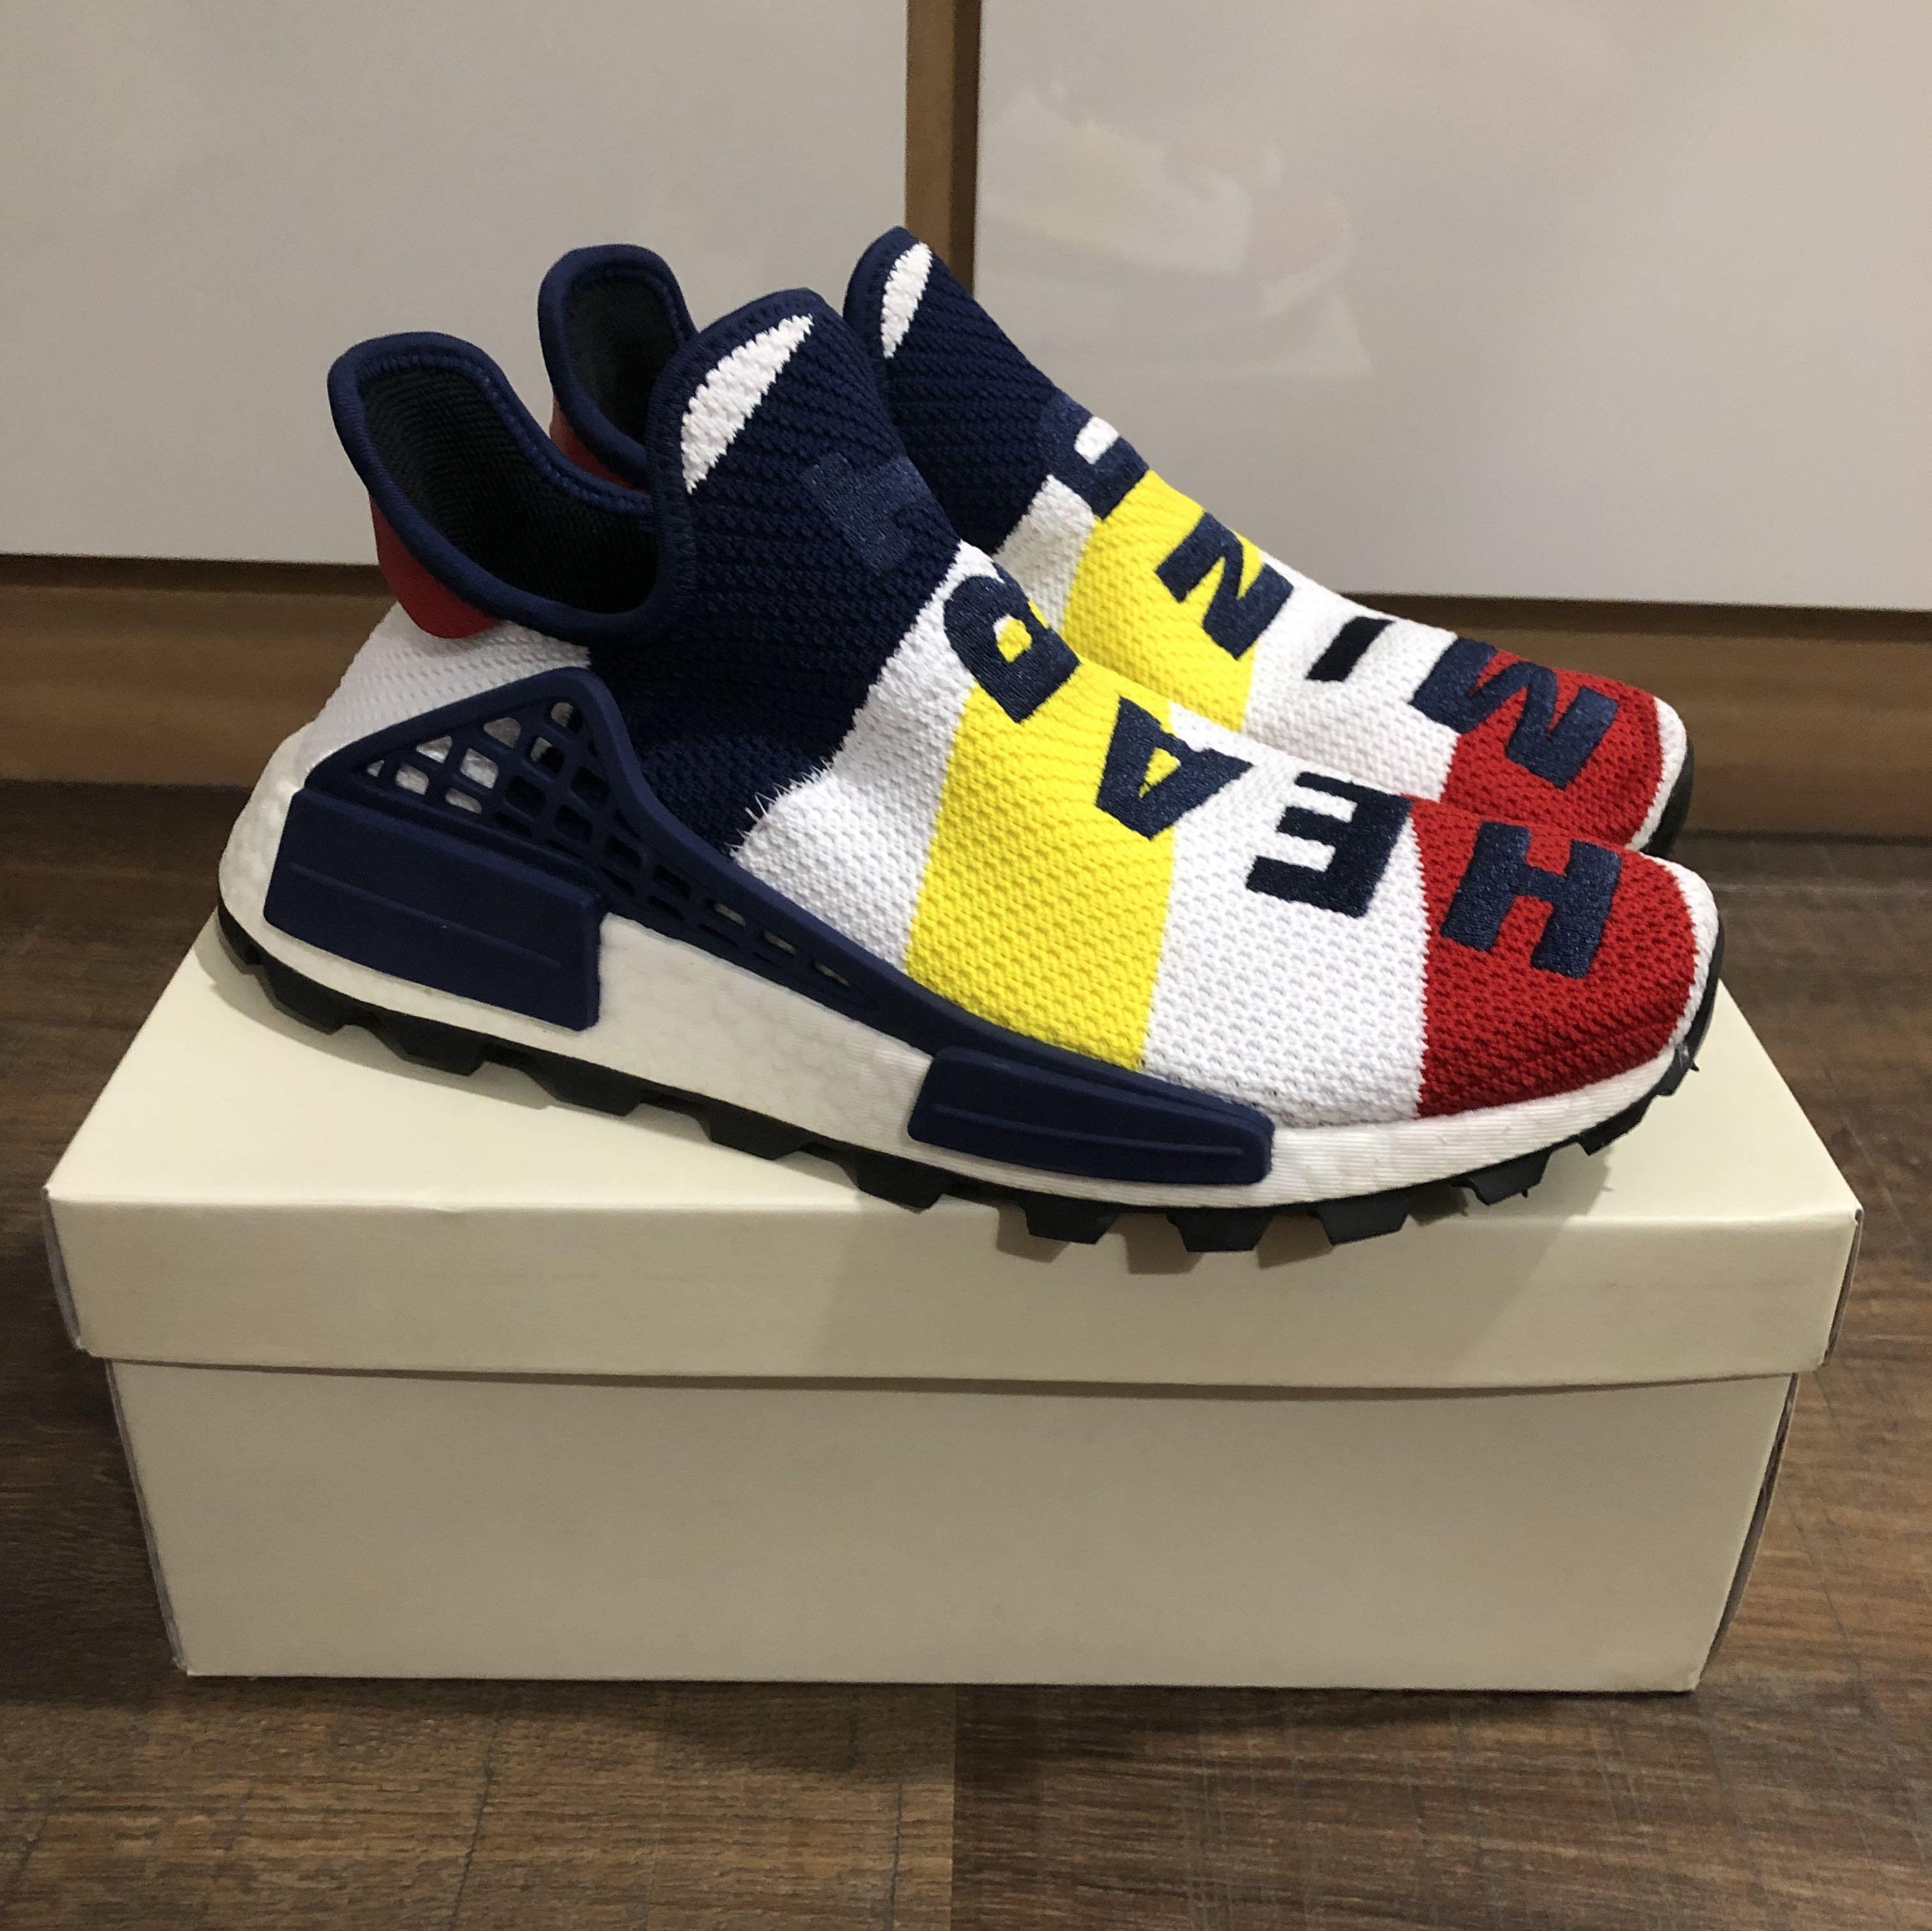 Adidas Billionaire Boys Club human race for sale, Men's